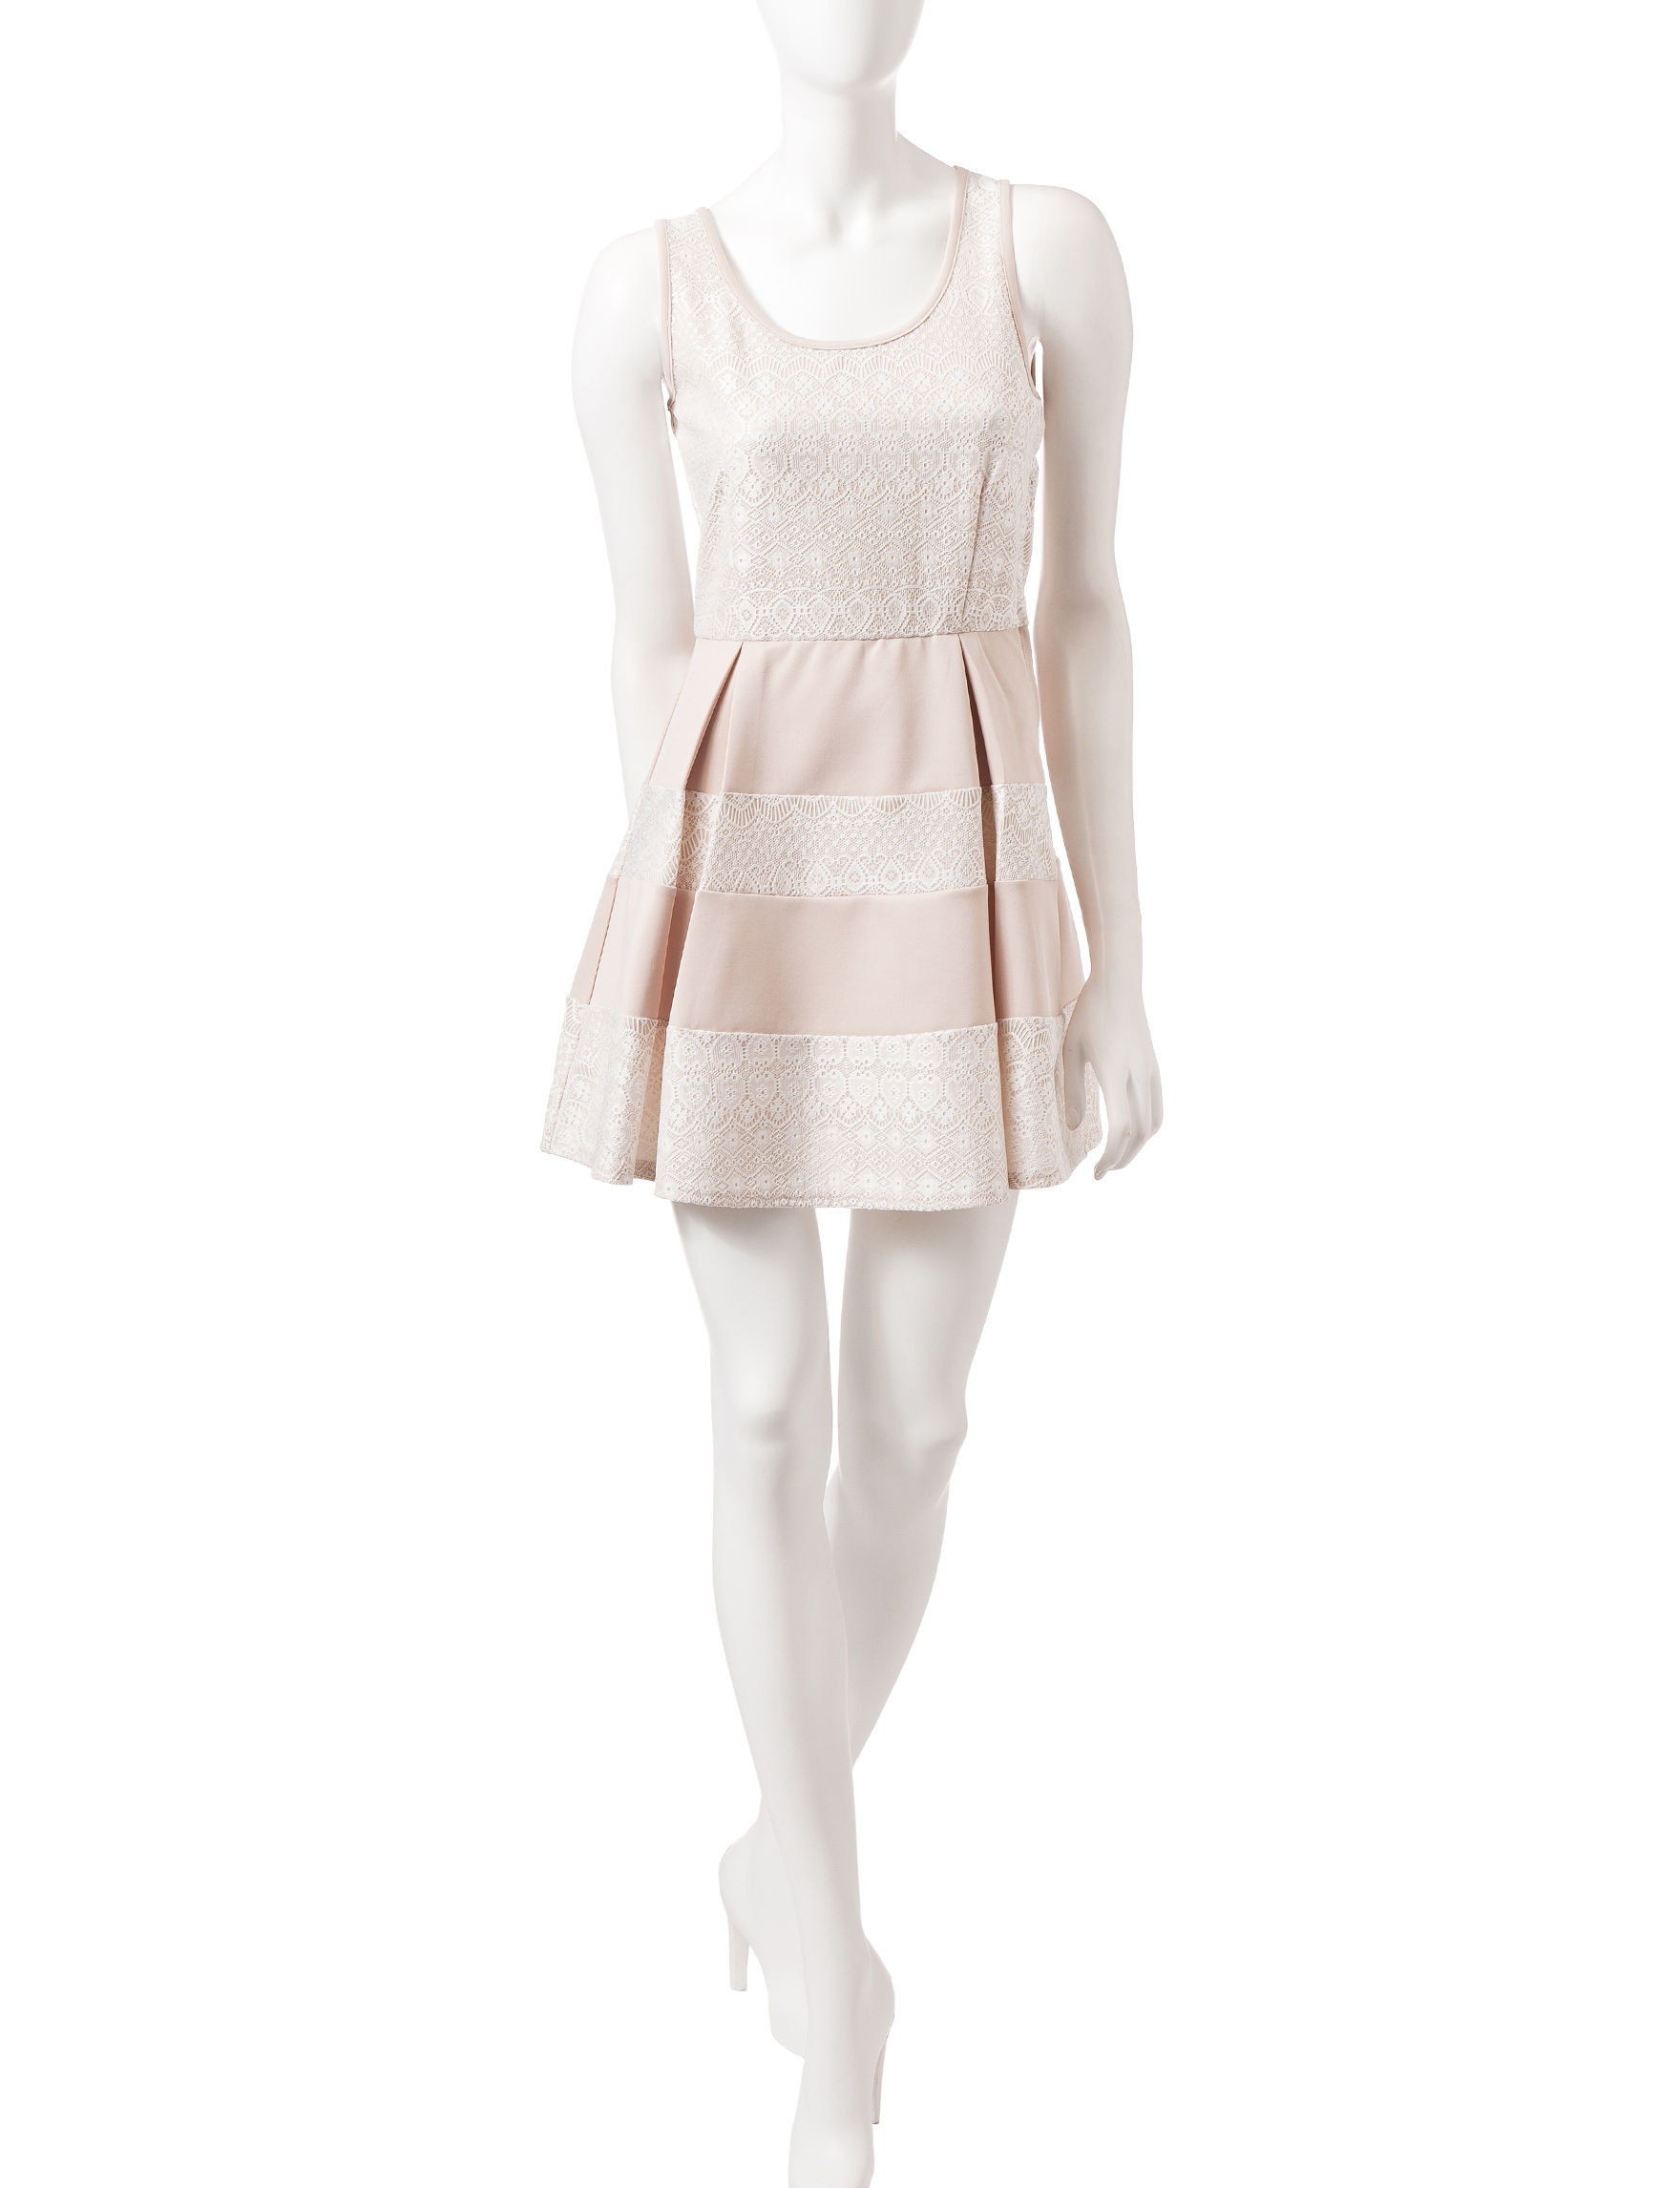 Trixxi Ivory Everyday & Casual Shift Dresses